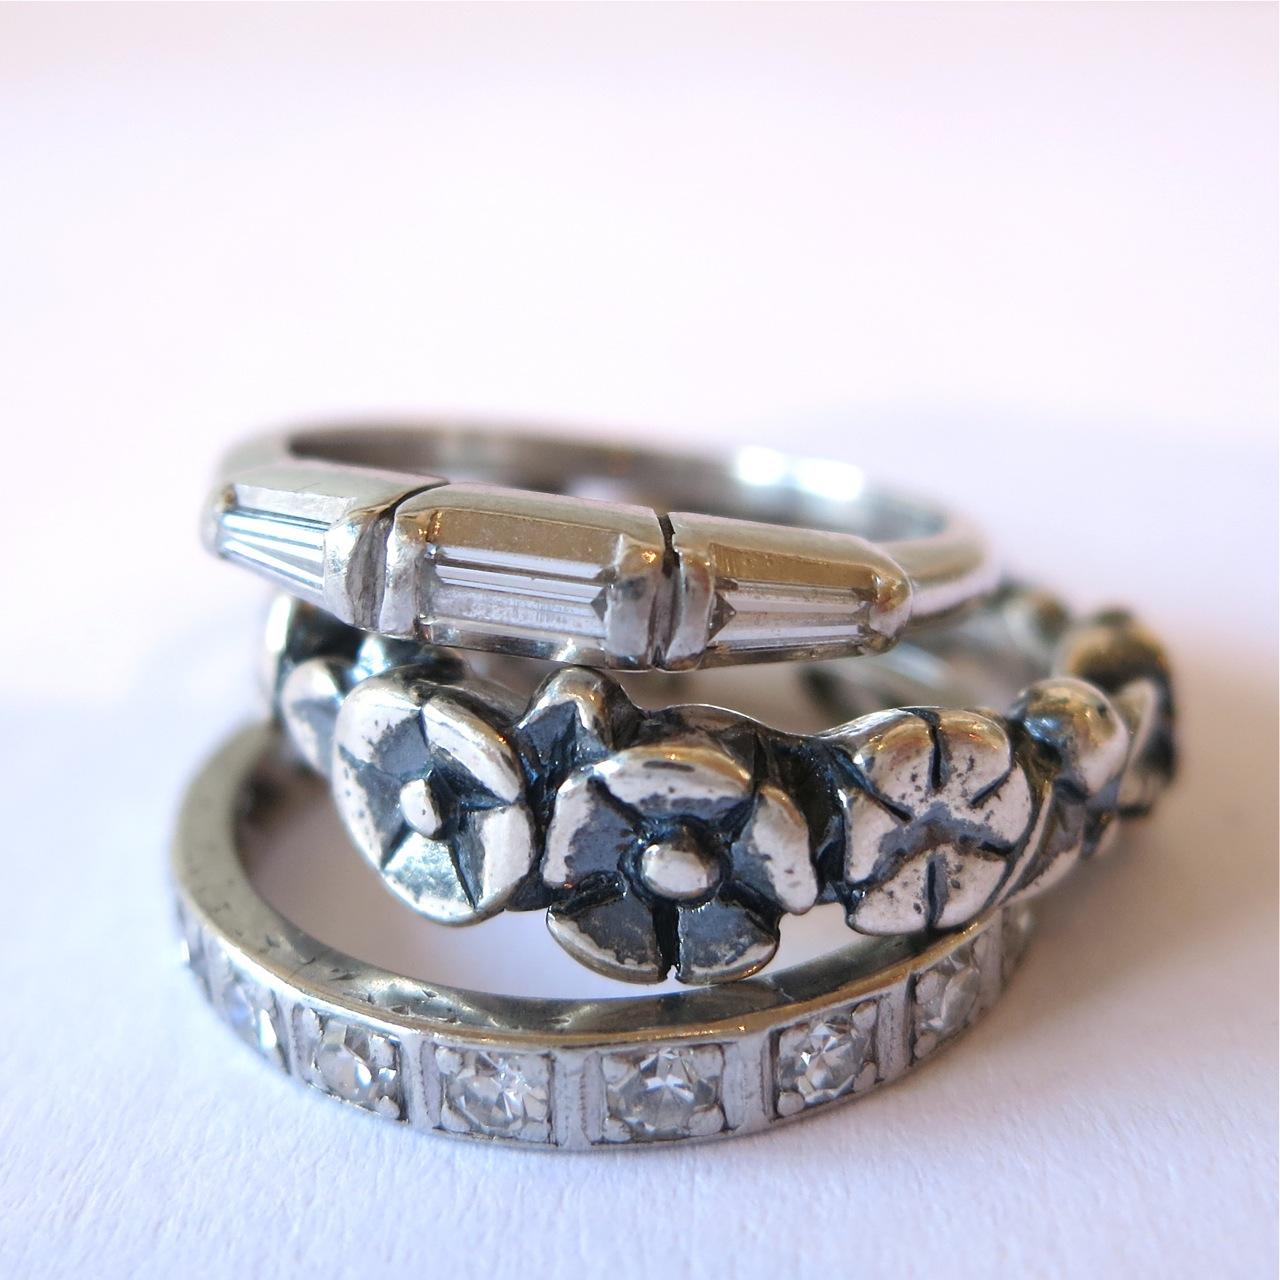 trollbeads ring – tartooful 290f612a1361